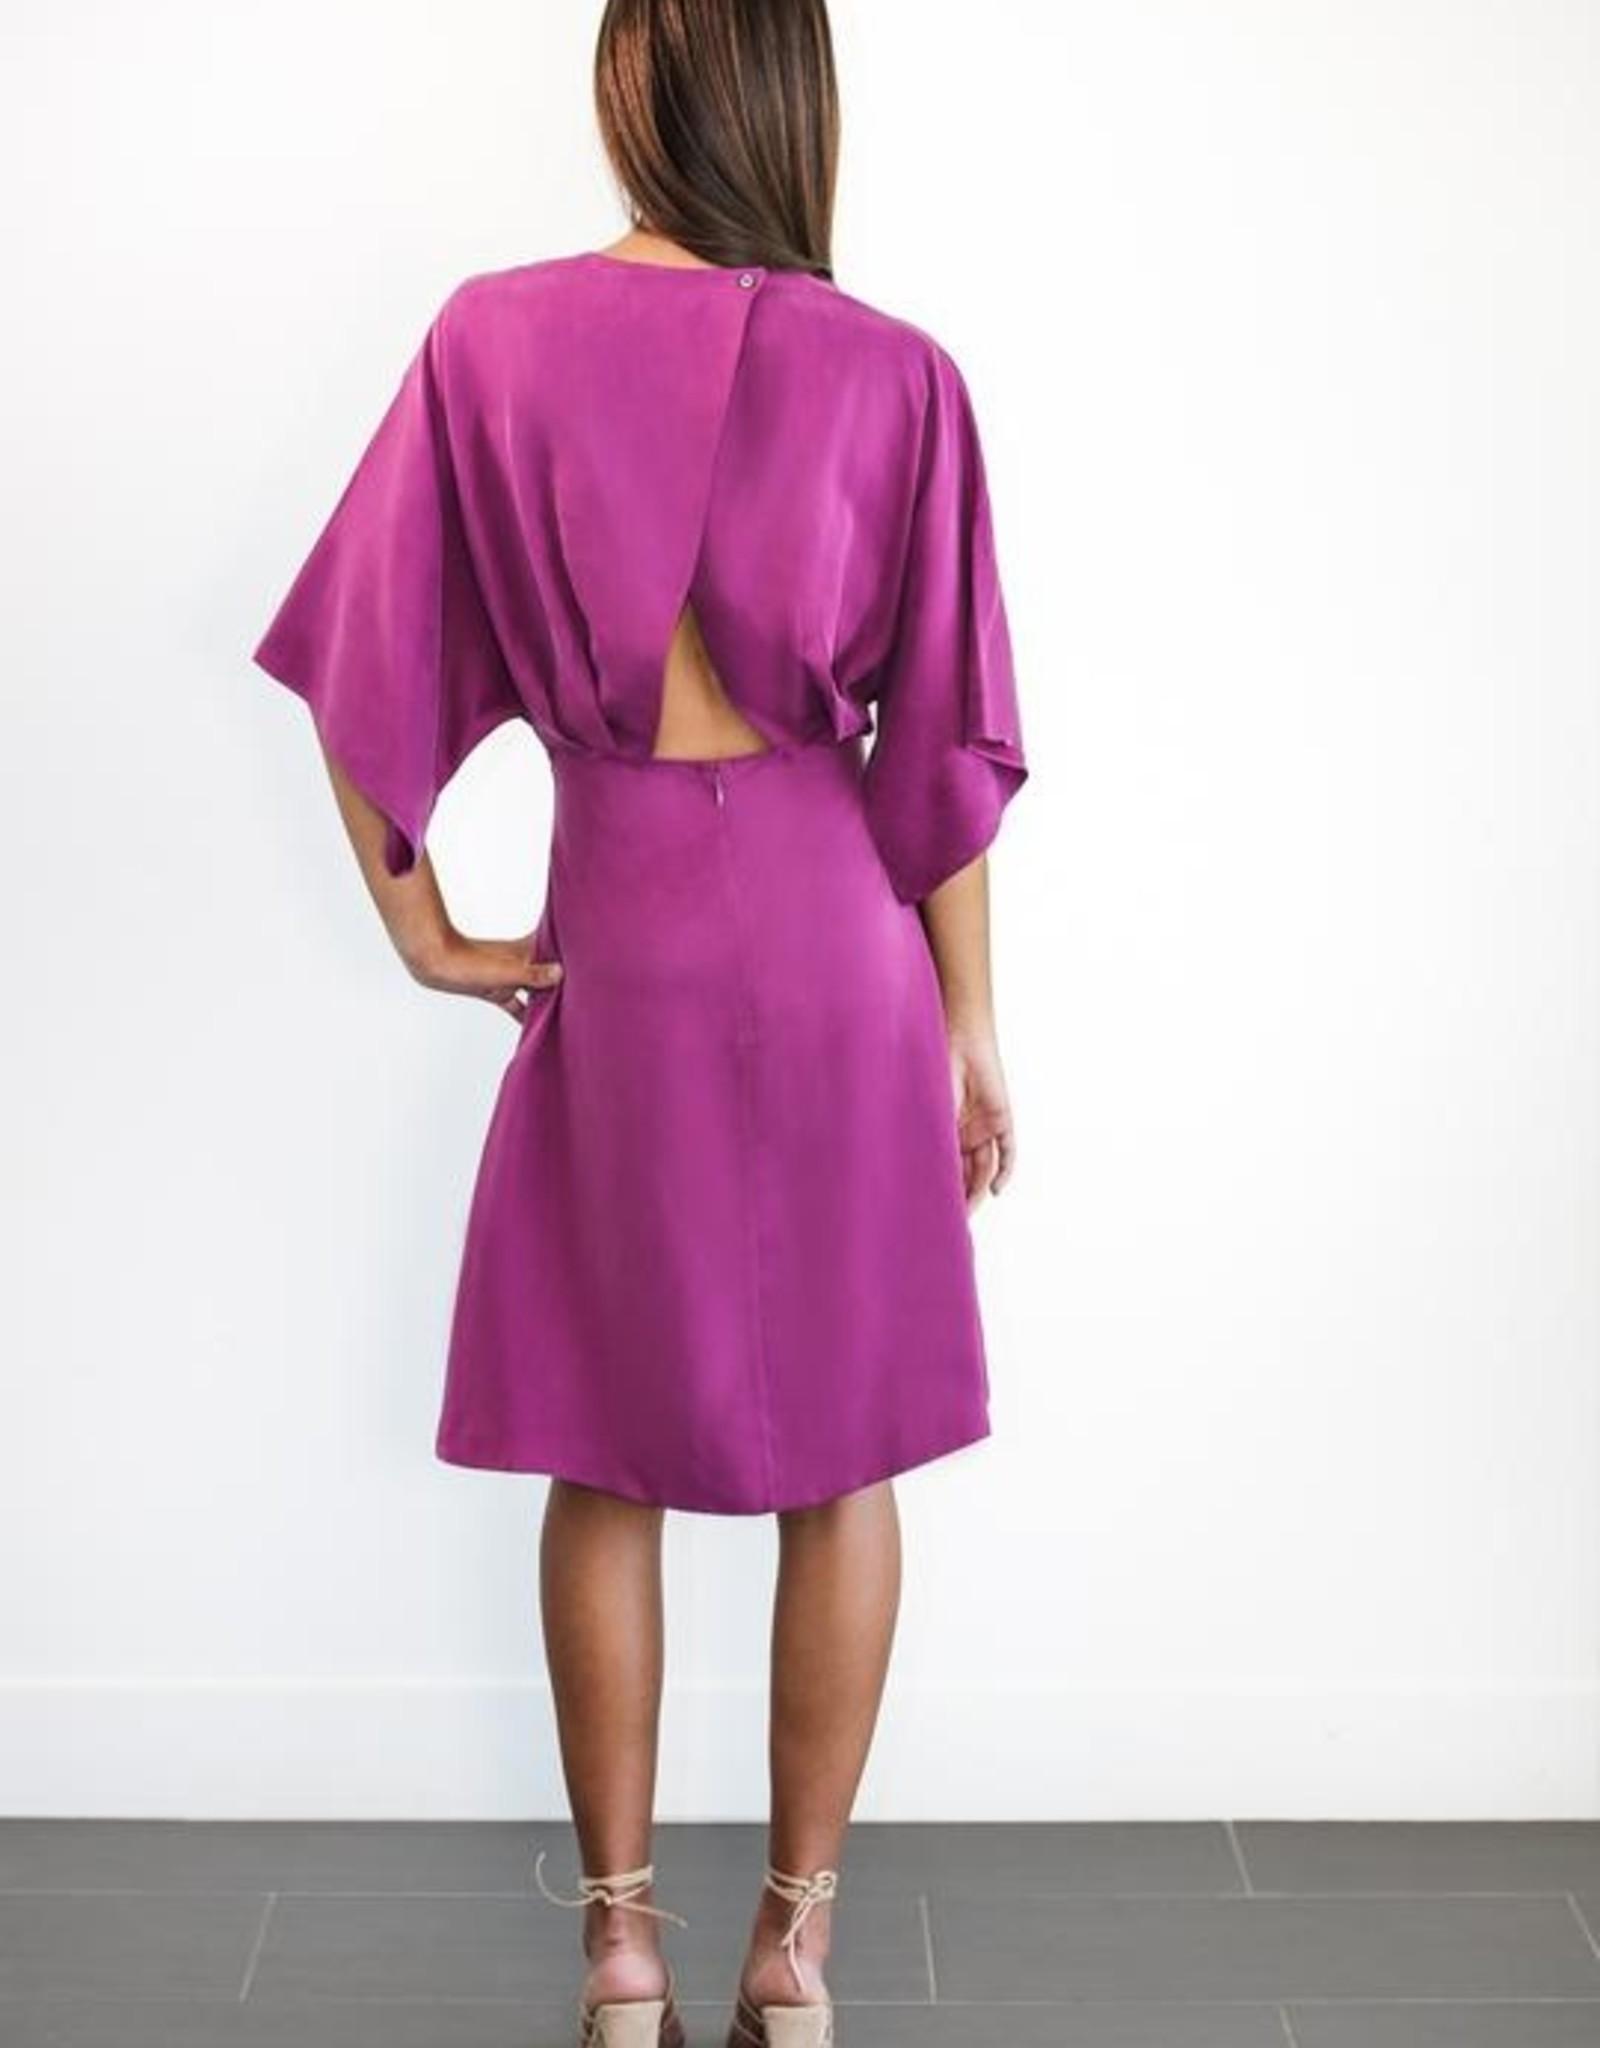 GLENN & GLENN - Cora Dress